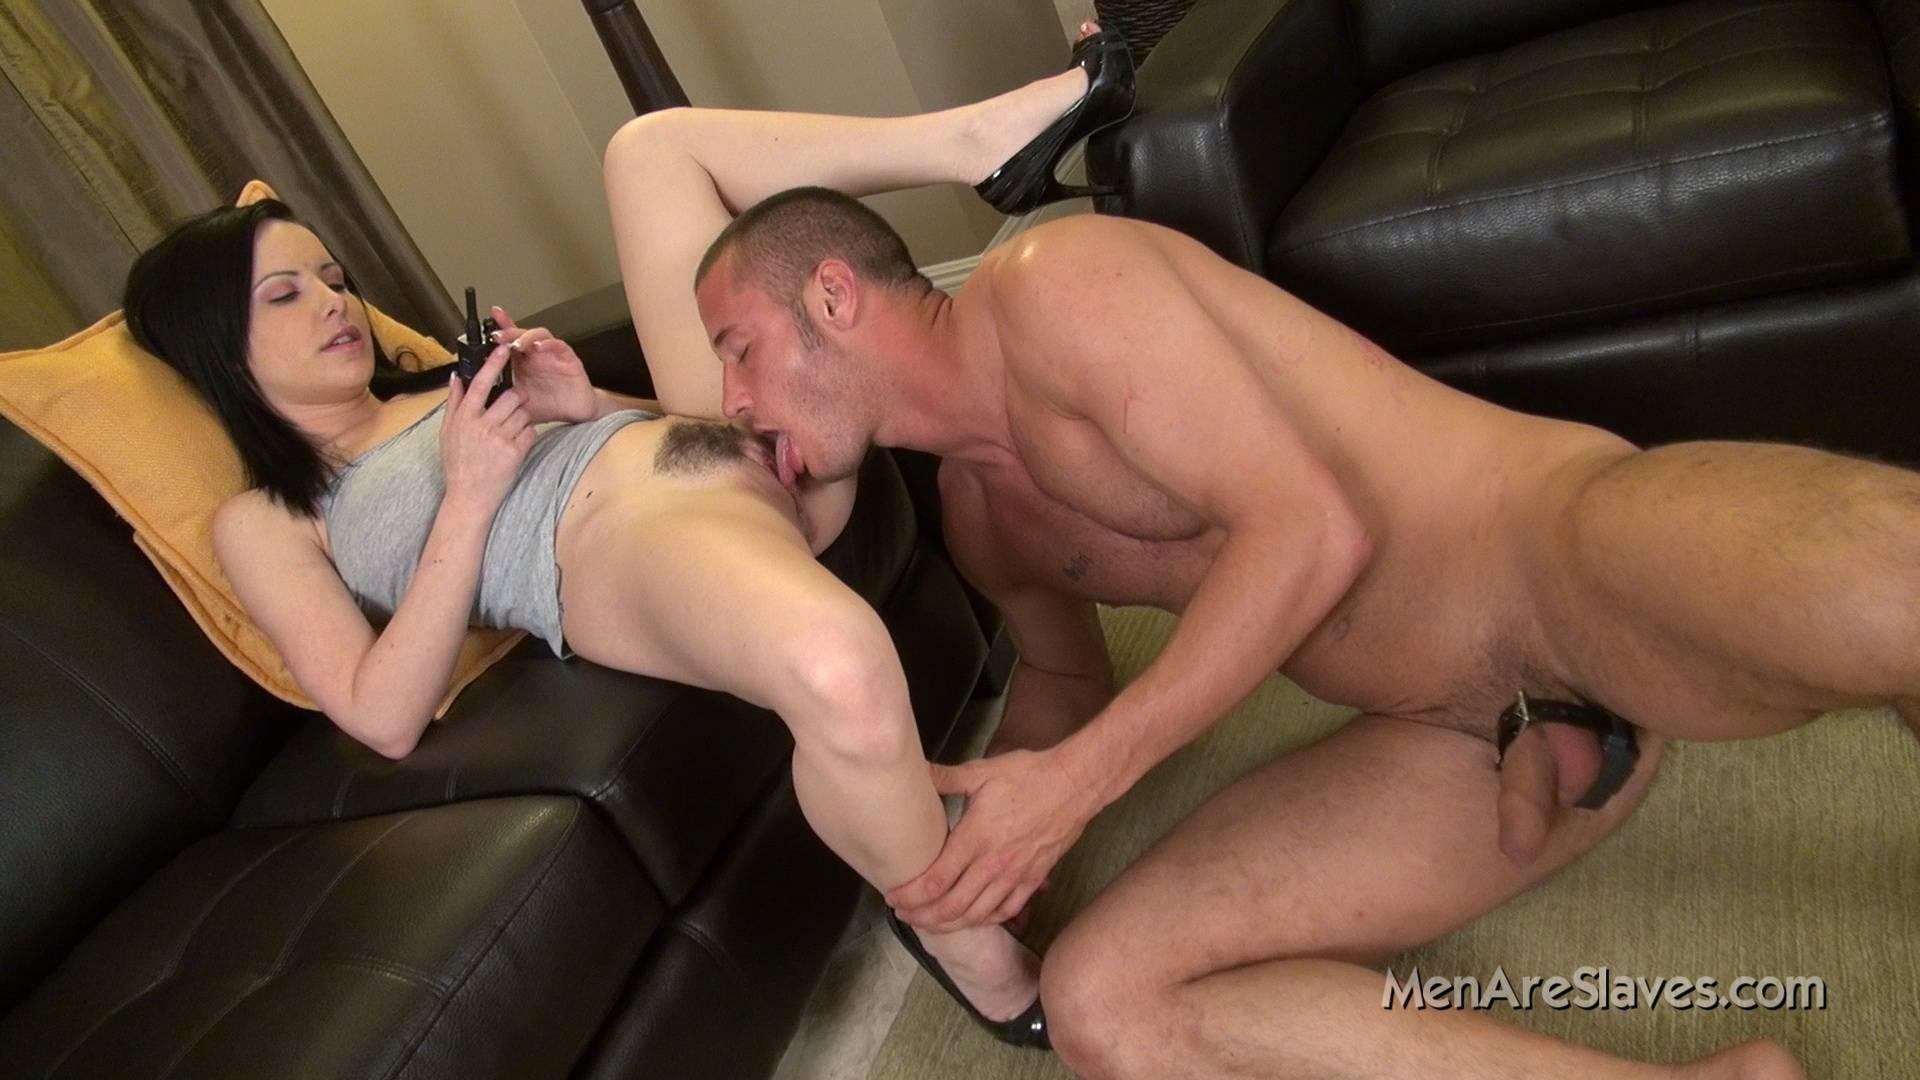 Femdom wife submissive husband